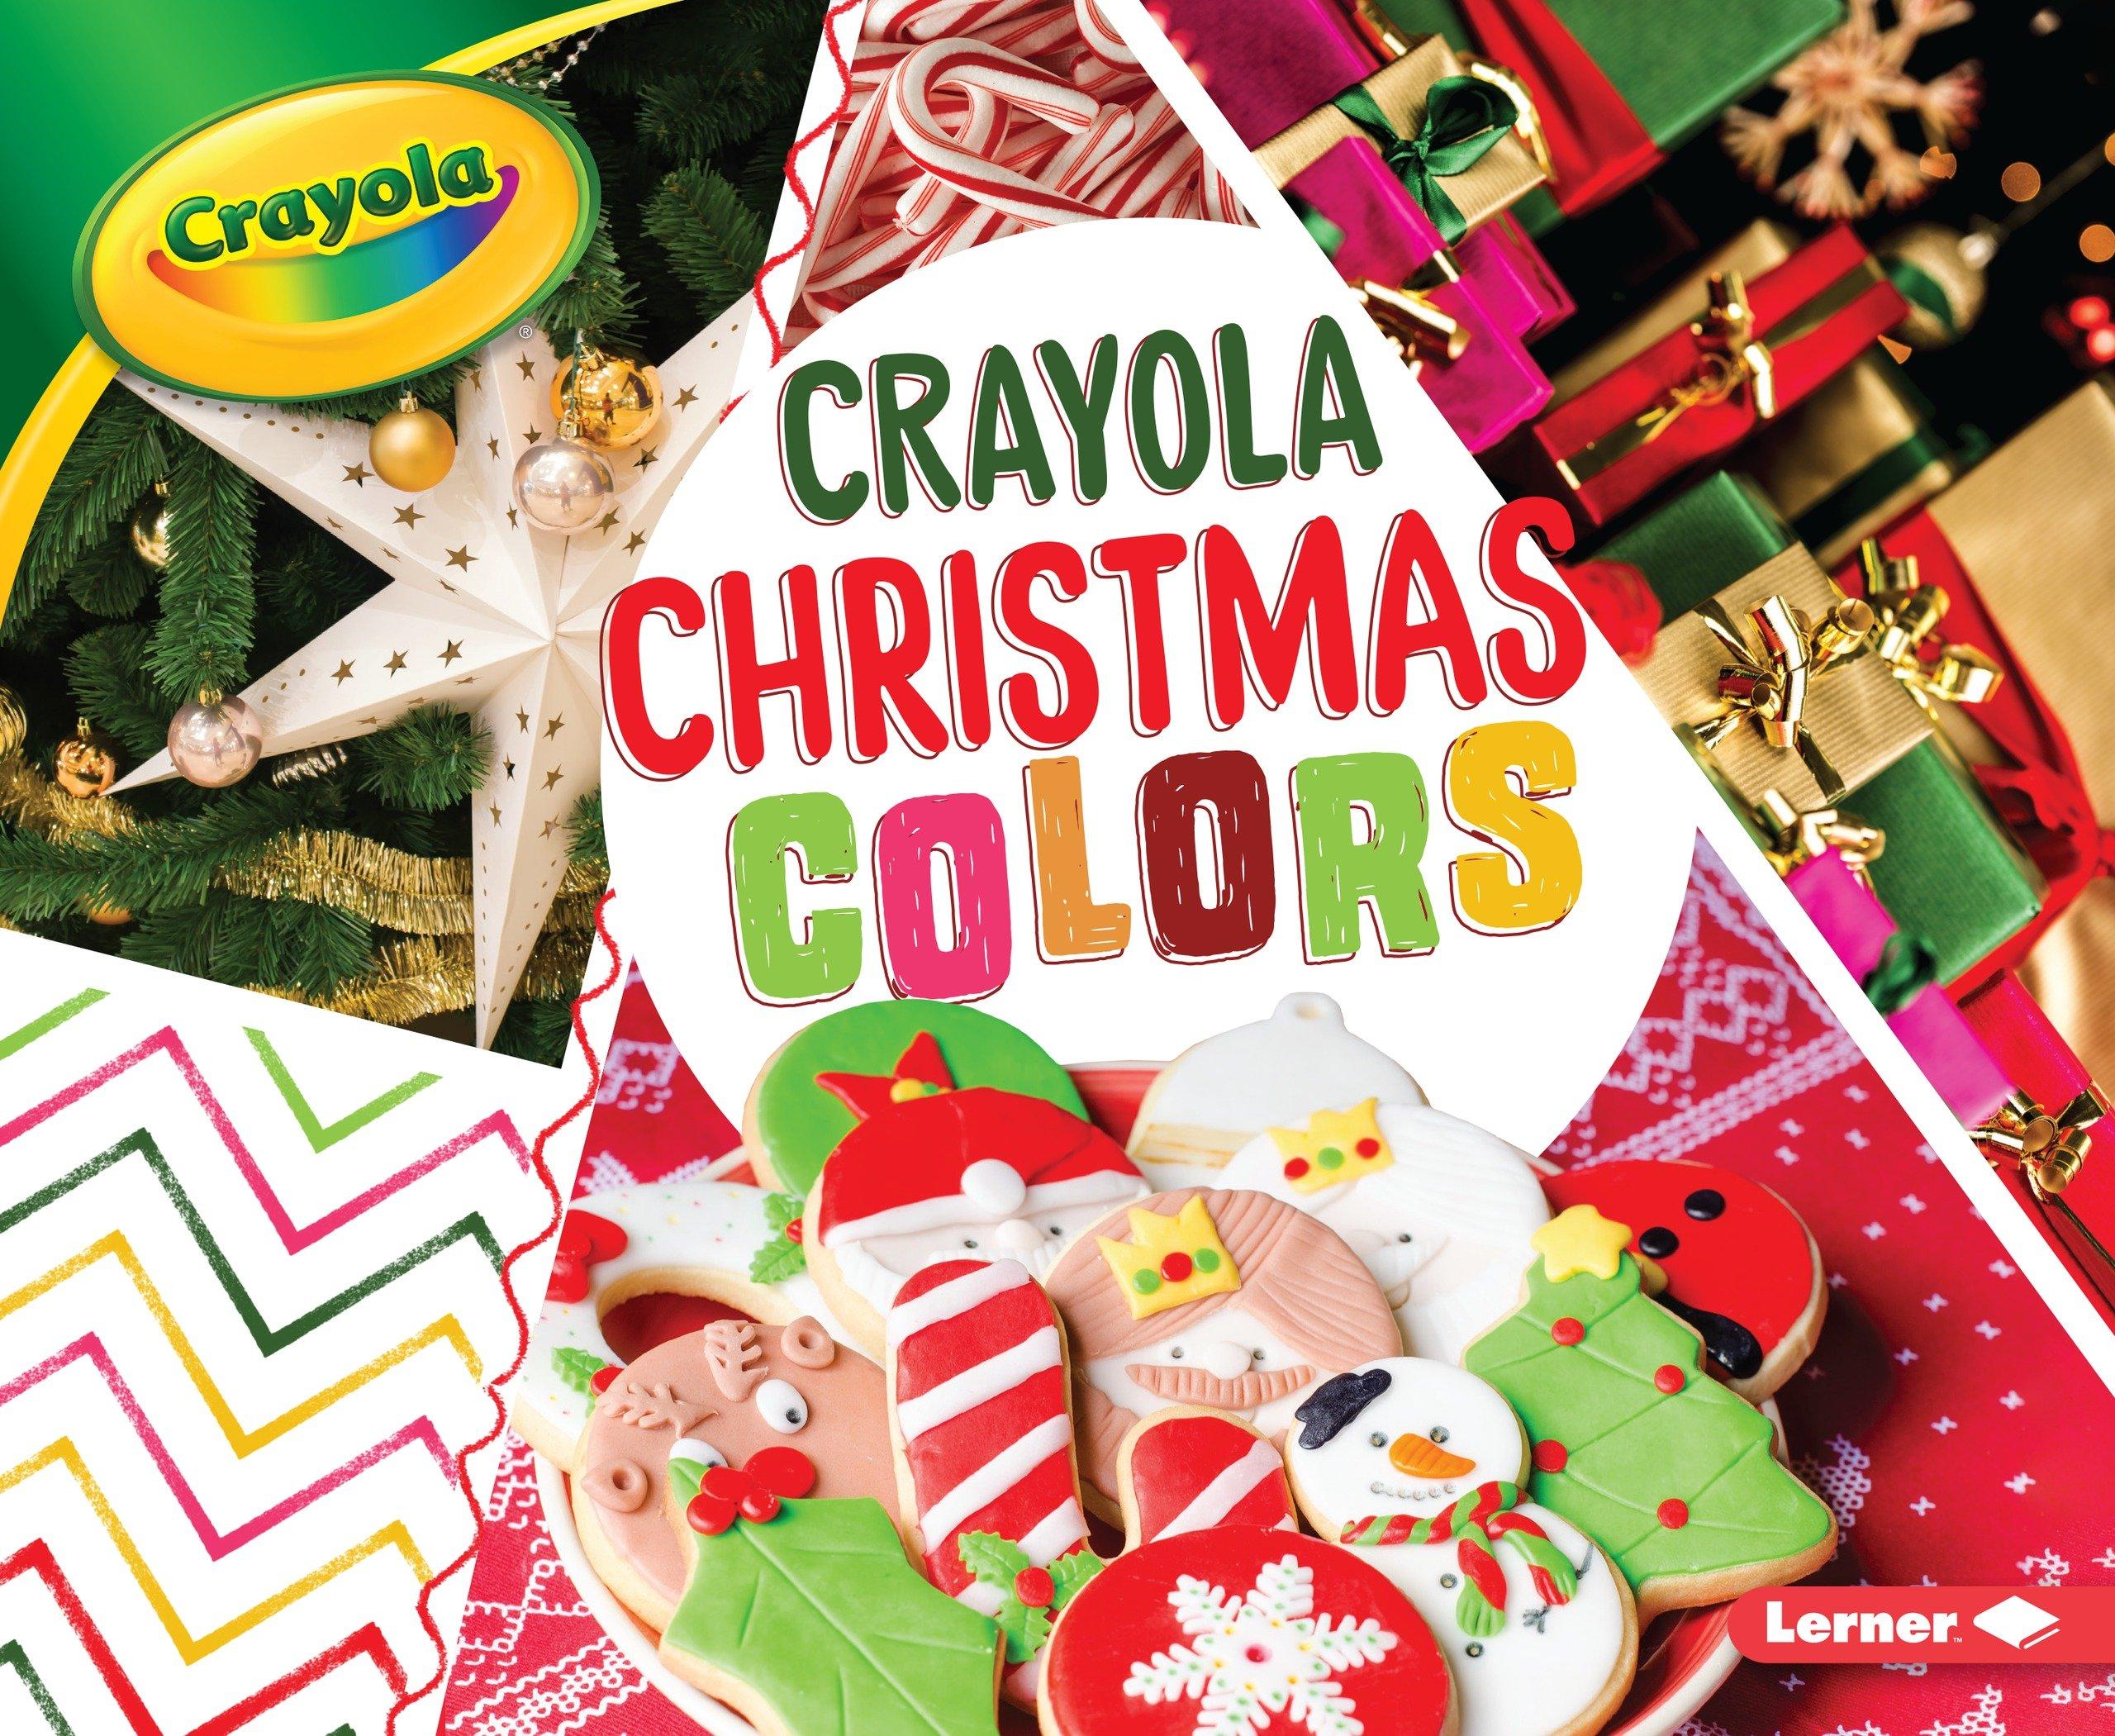 Christmas Colors.Crayola Christmas Colors Crayola Holiday Colors Mari